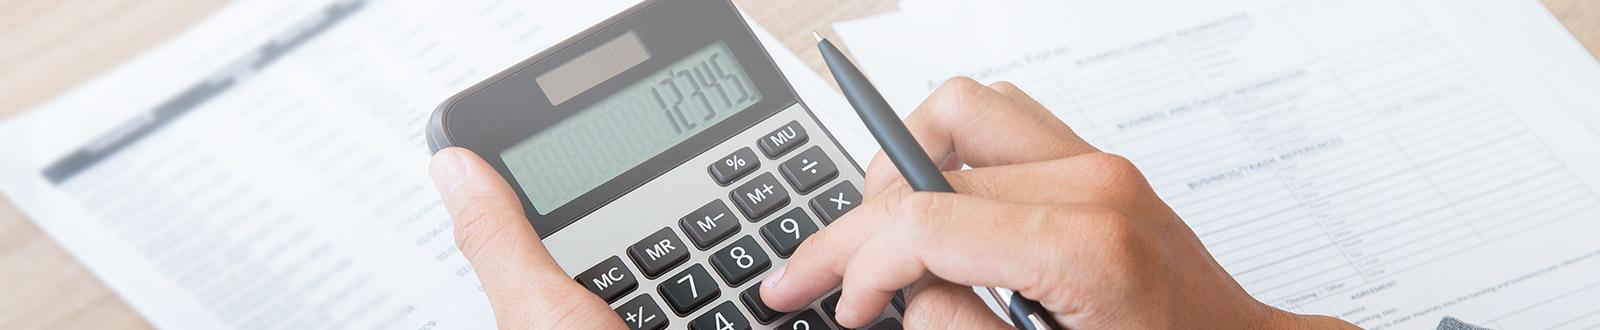 financial-accounting-&-advisory-services-uk